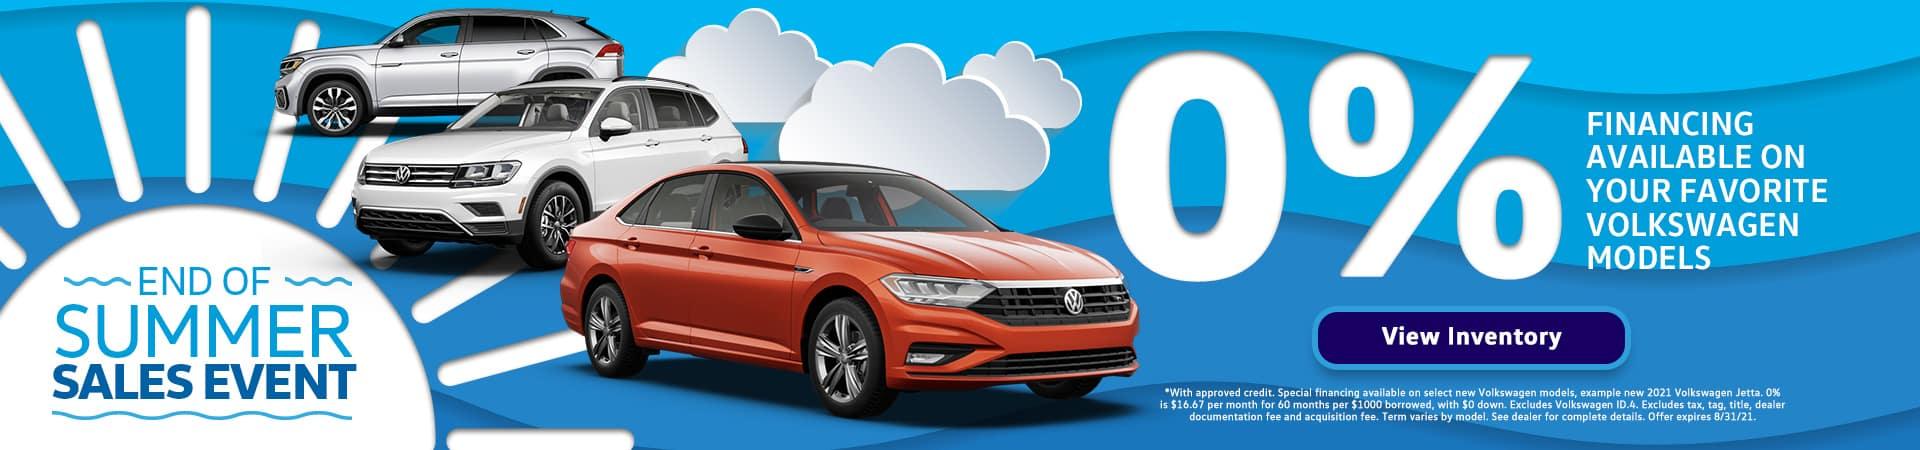 2021 Volkswagen Models for sale in Brandon, FL